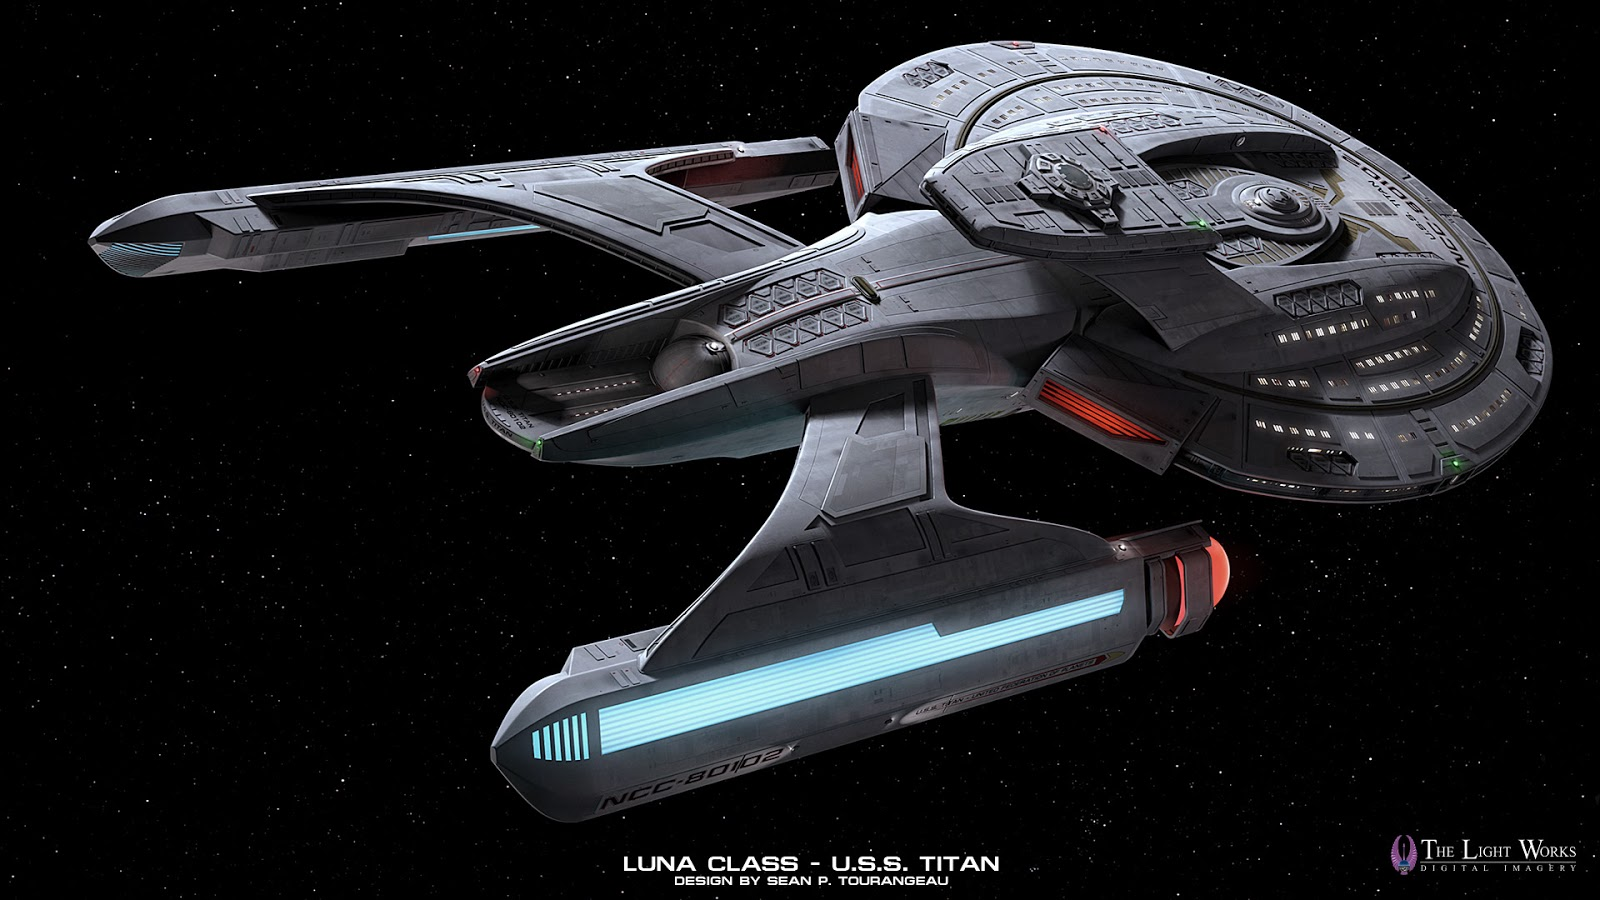 Star Trek Titan Tv Series Unveiling The USS TITAN